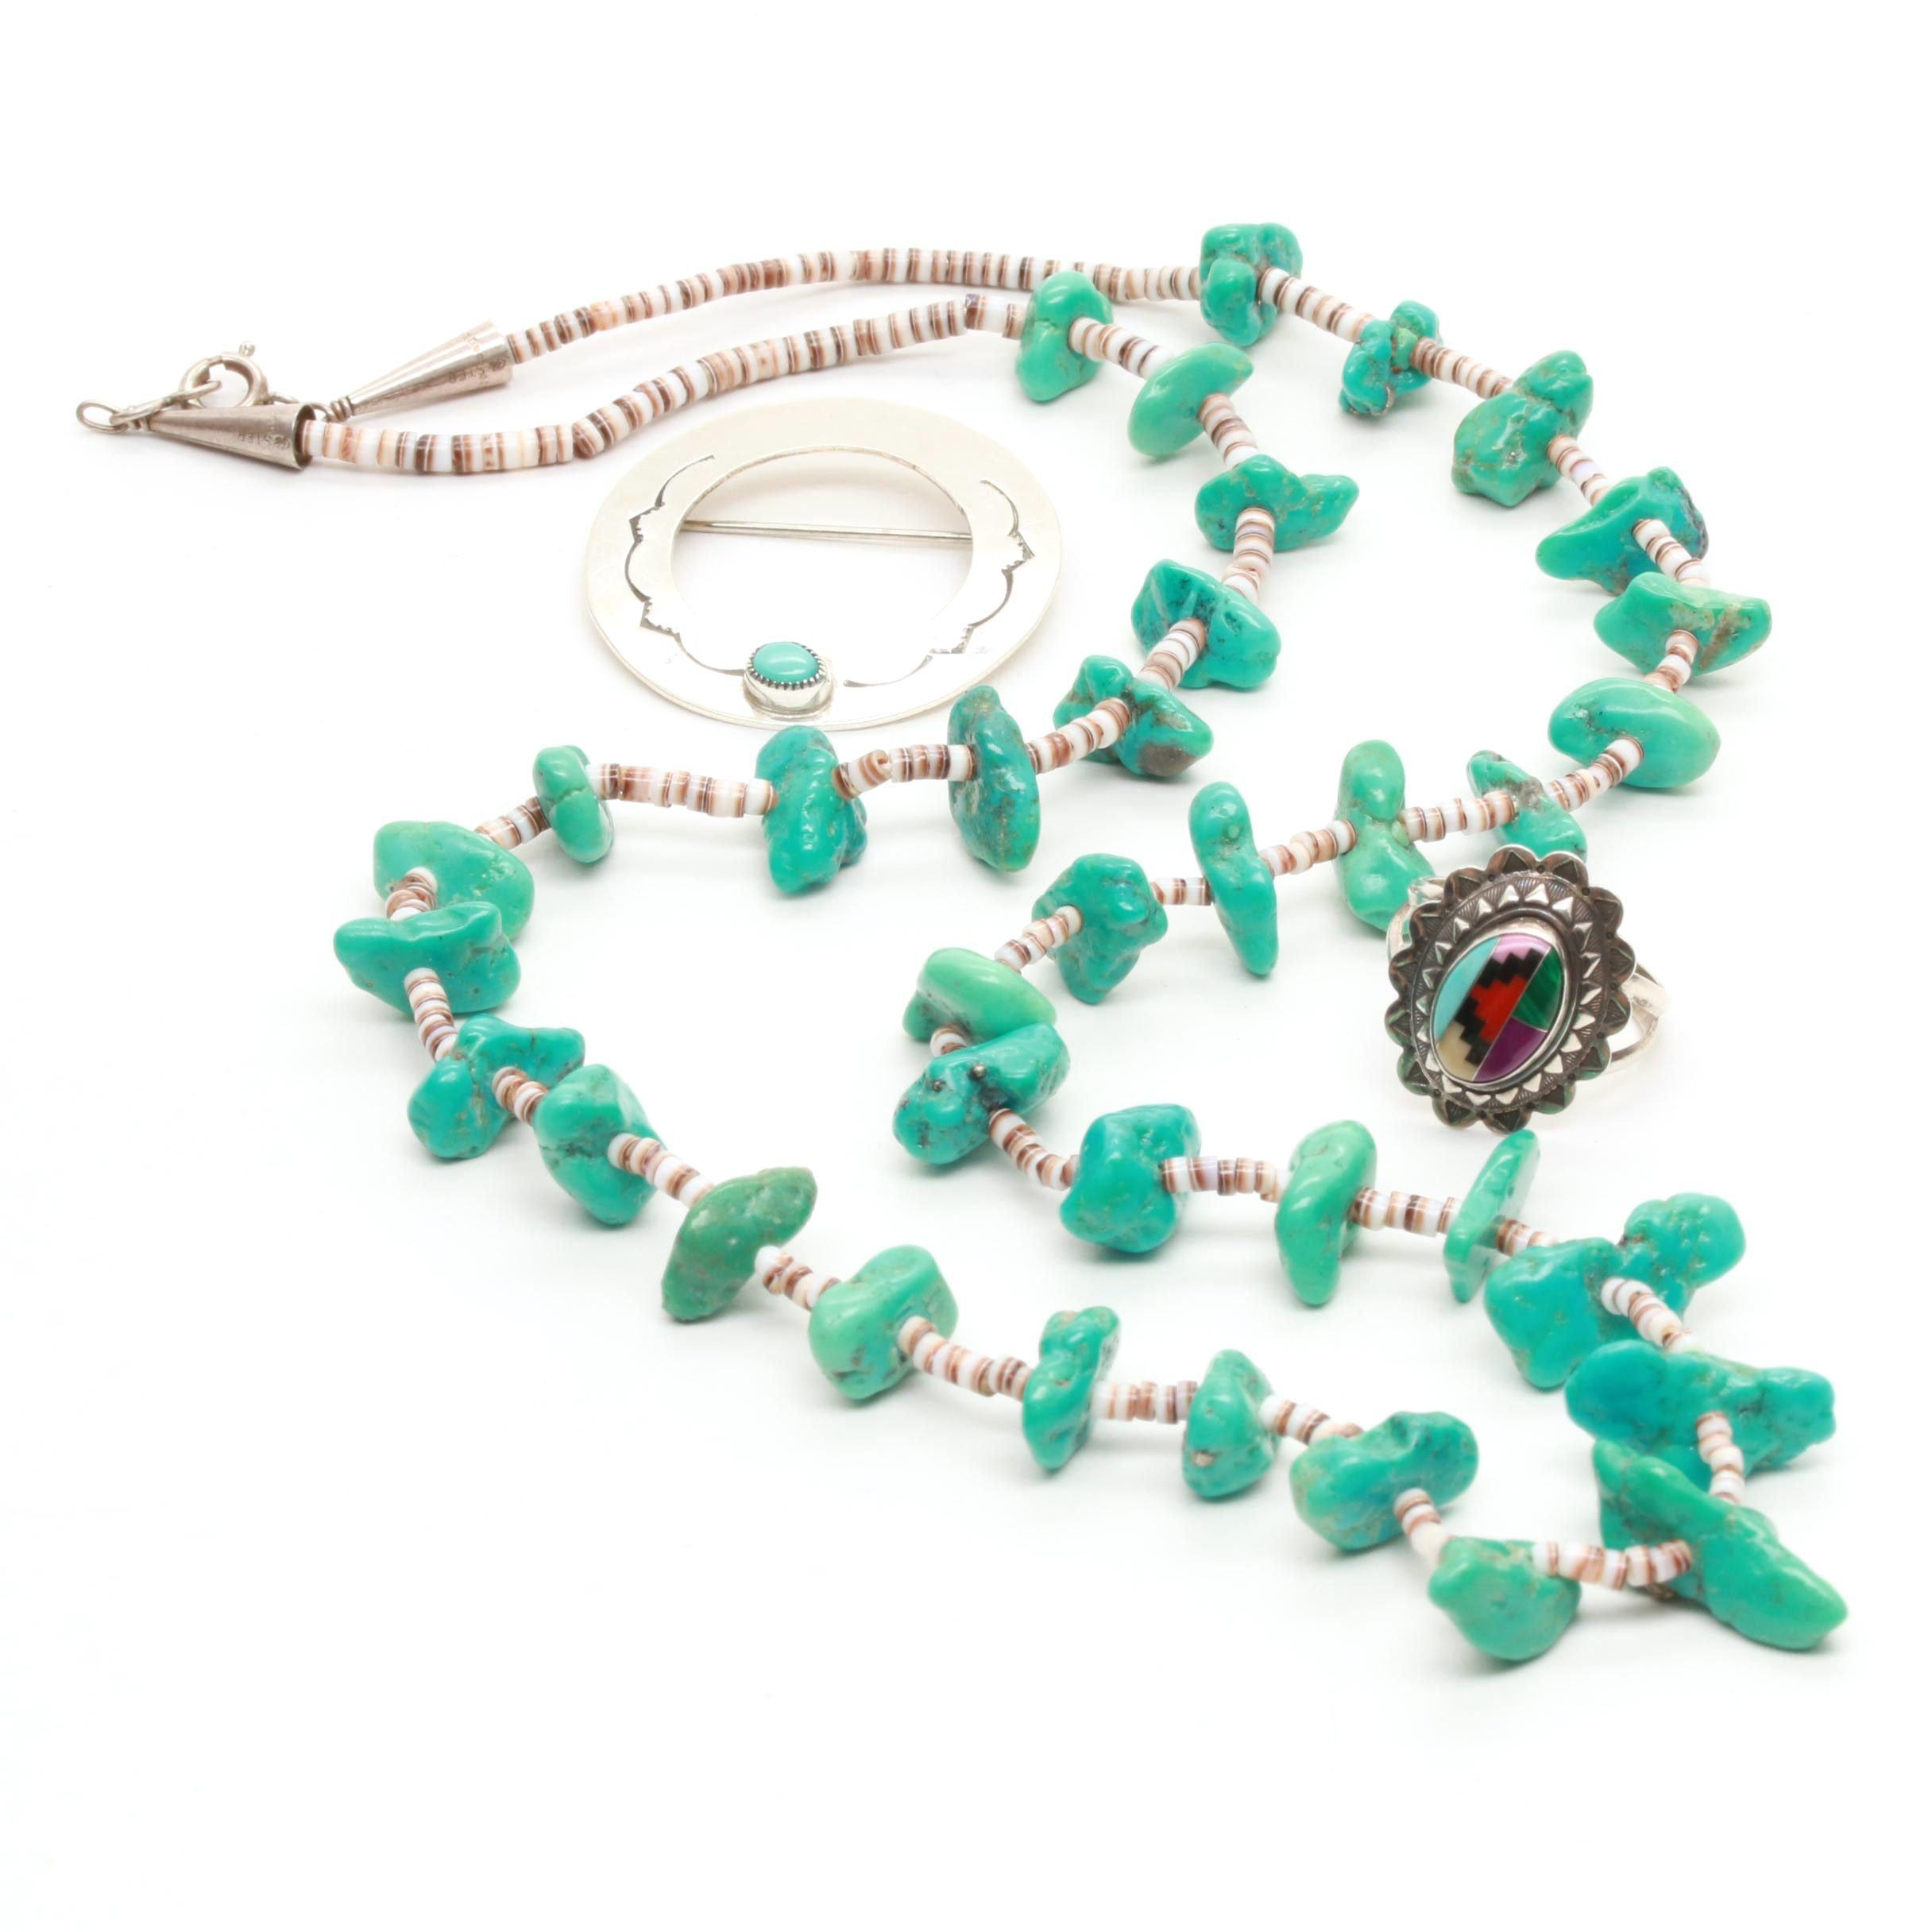 Assorted Southwestern Style Sterling Silver Gemstone Jewelry